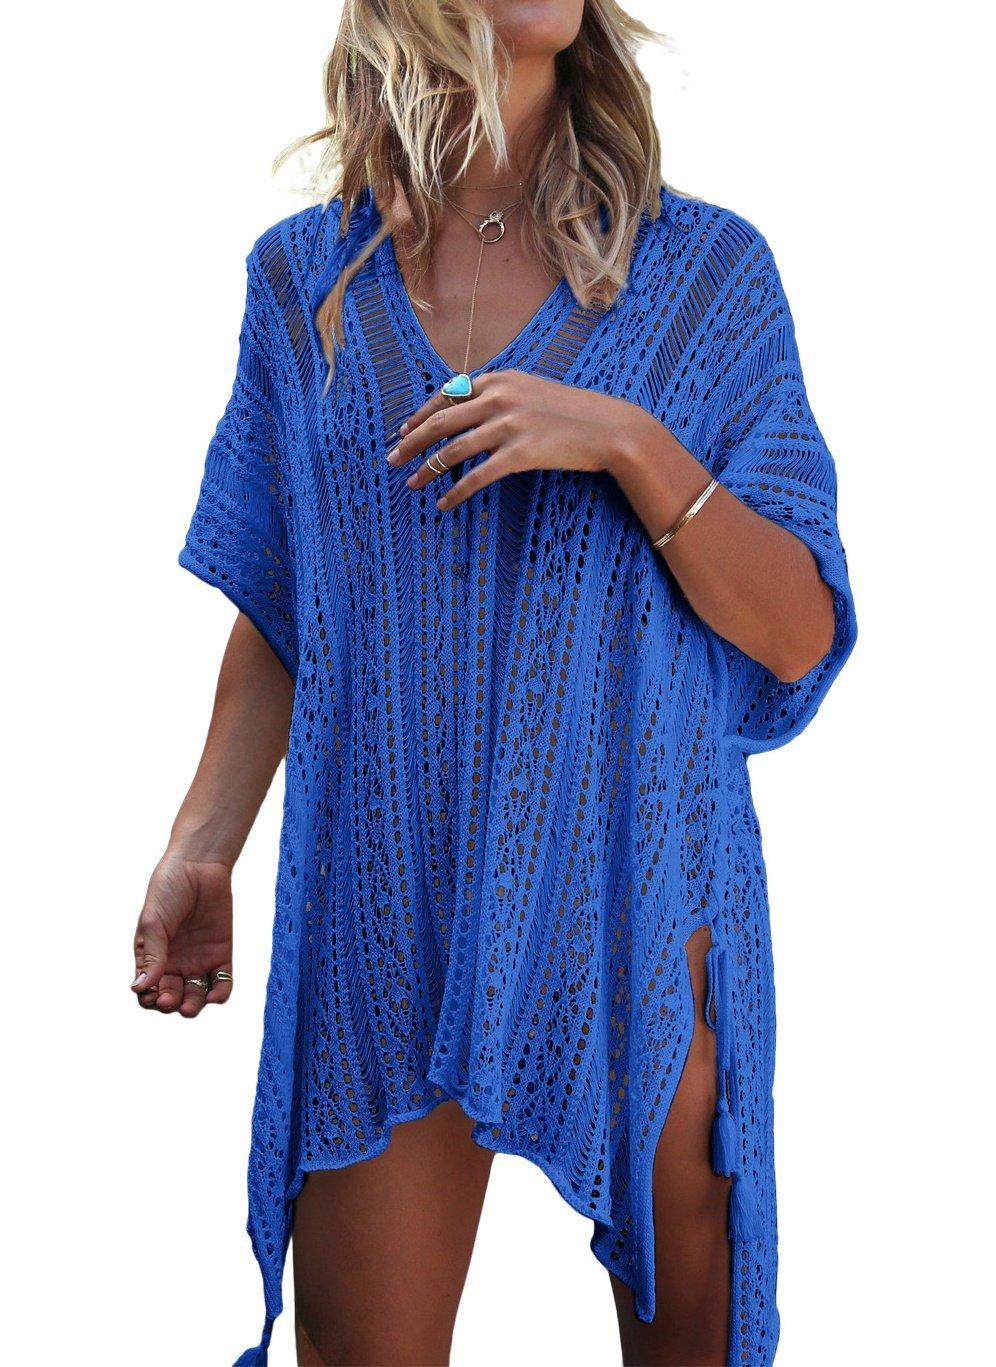 LeaLac Women's Summer Cotton Bathing Suit Cover up Beach Bikini Swimsuit Swimwear Crochet Dress Gift for Women LXF13 Blue